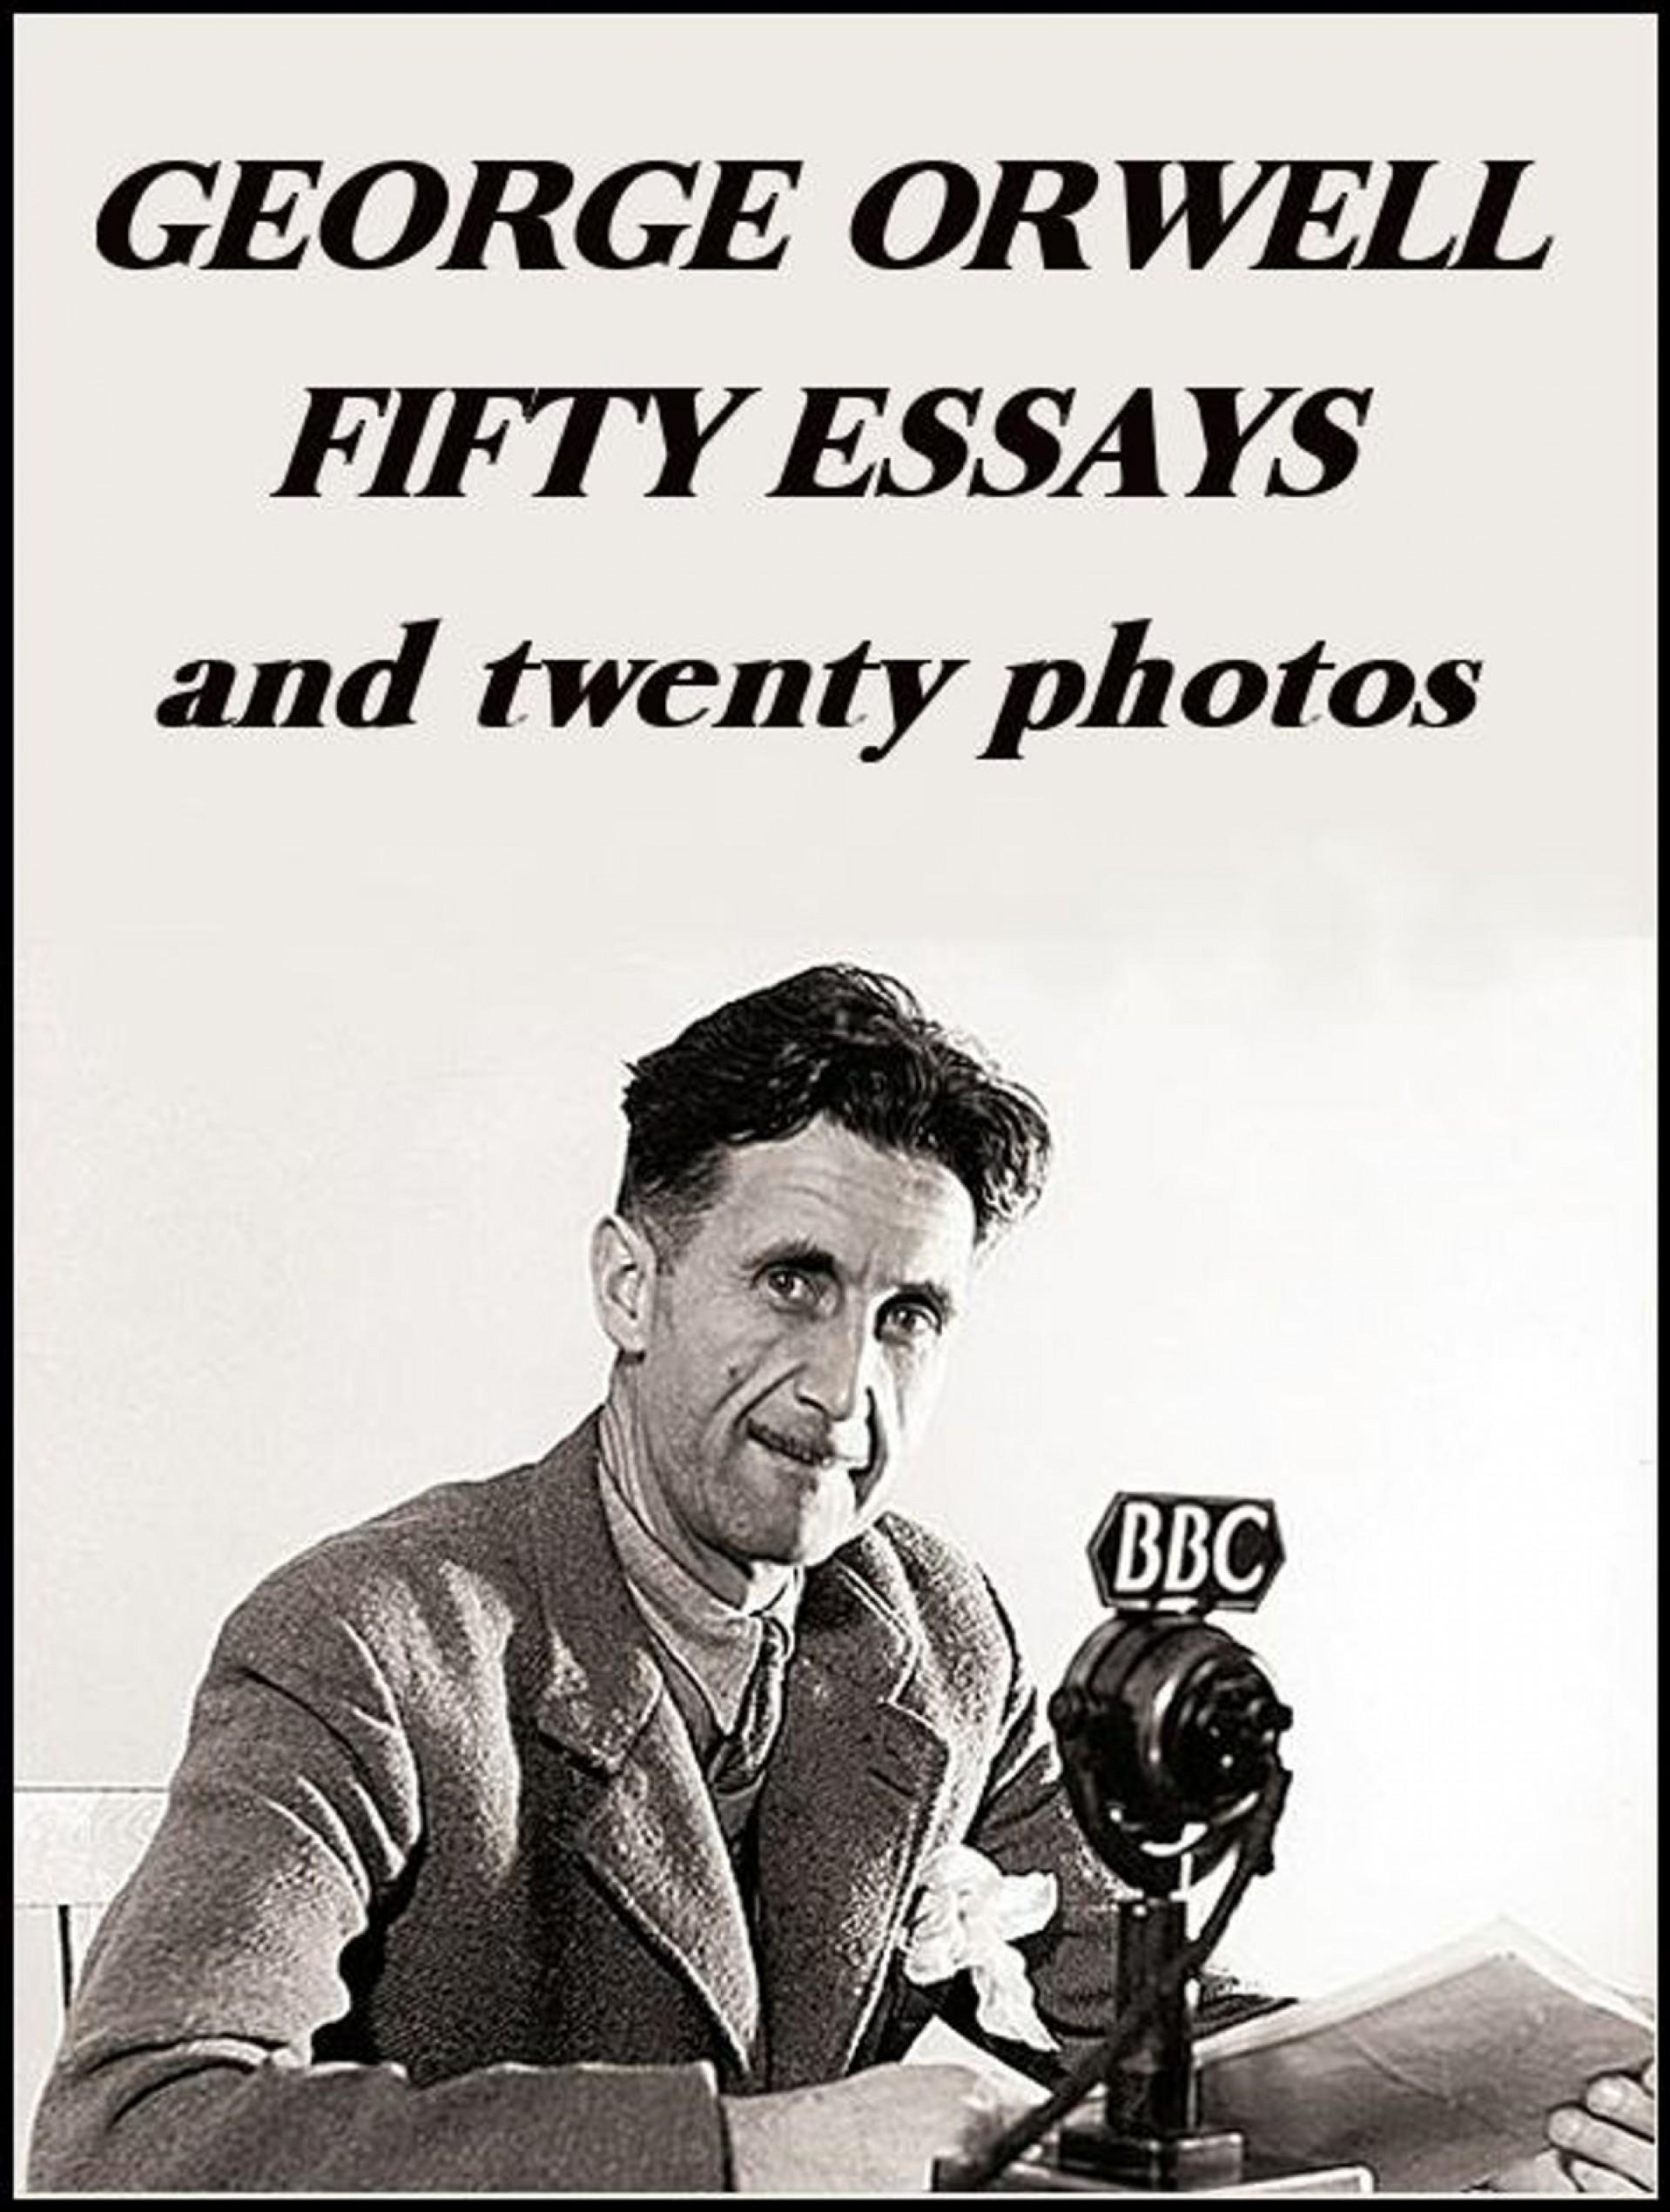 010 Essay Example George Orwell Fifty Frightening Essays Everyman's Library Summary Bookshop Memories 1920